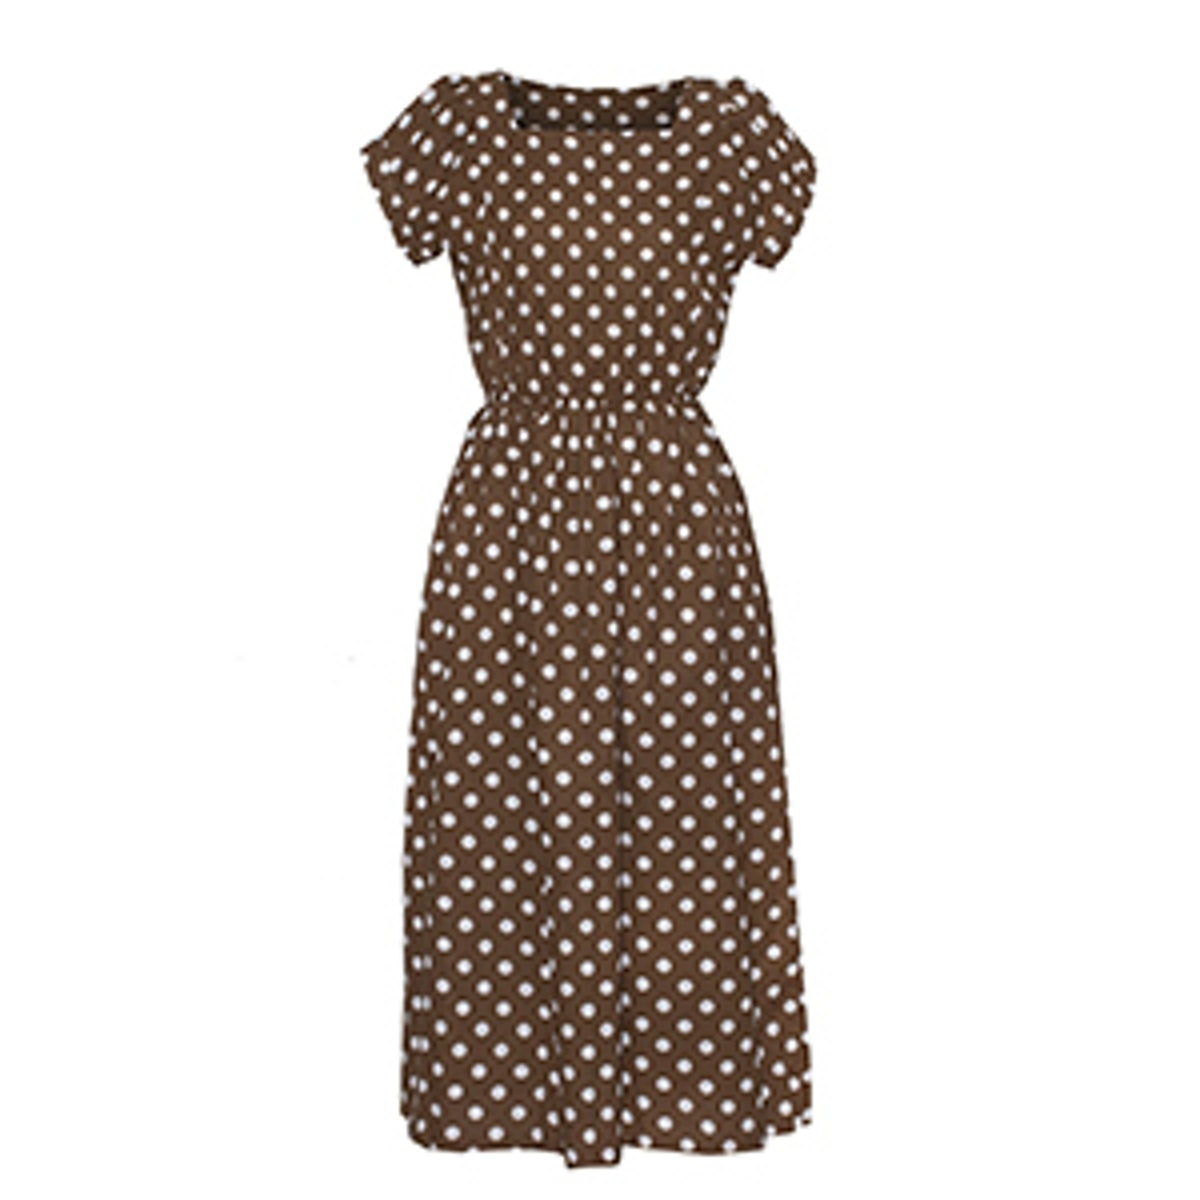 Brown Polka Dot Midi Dress